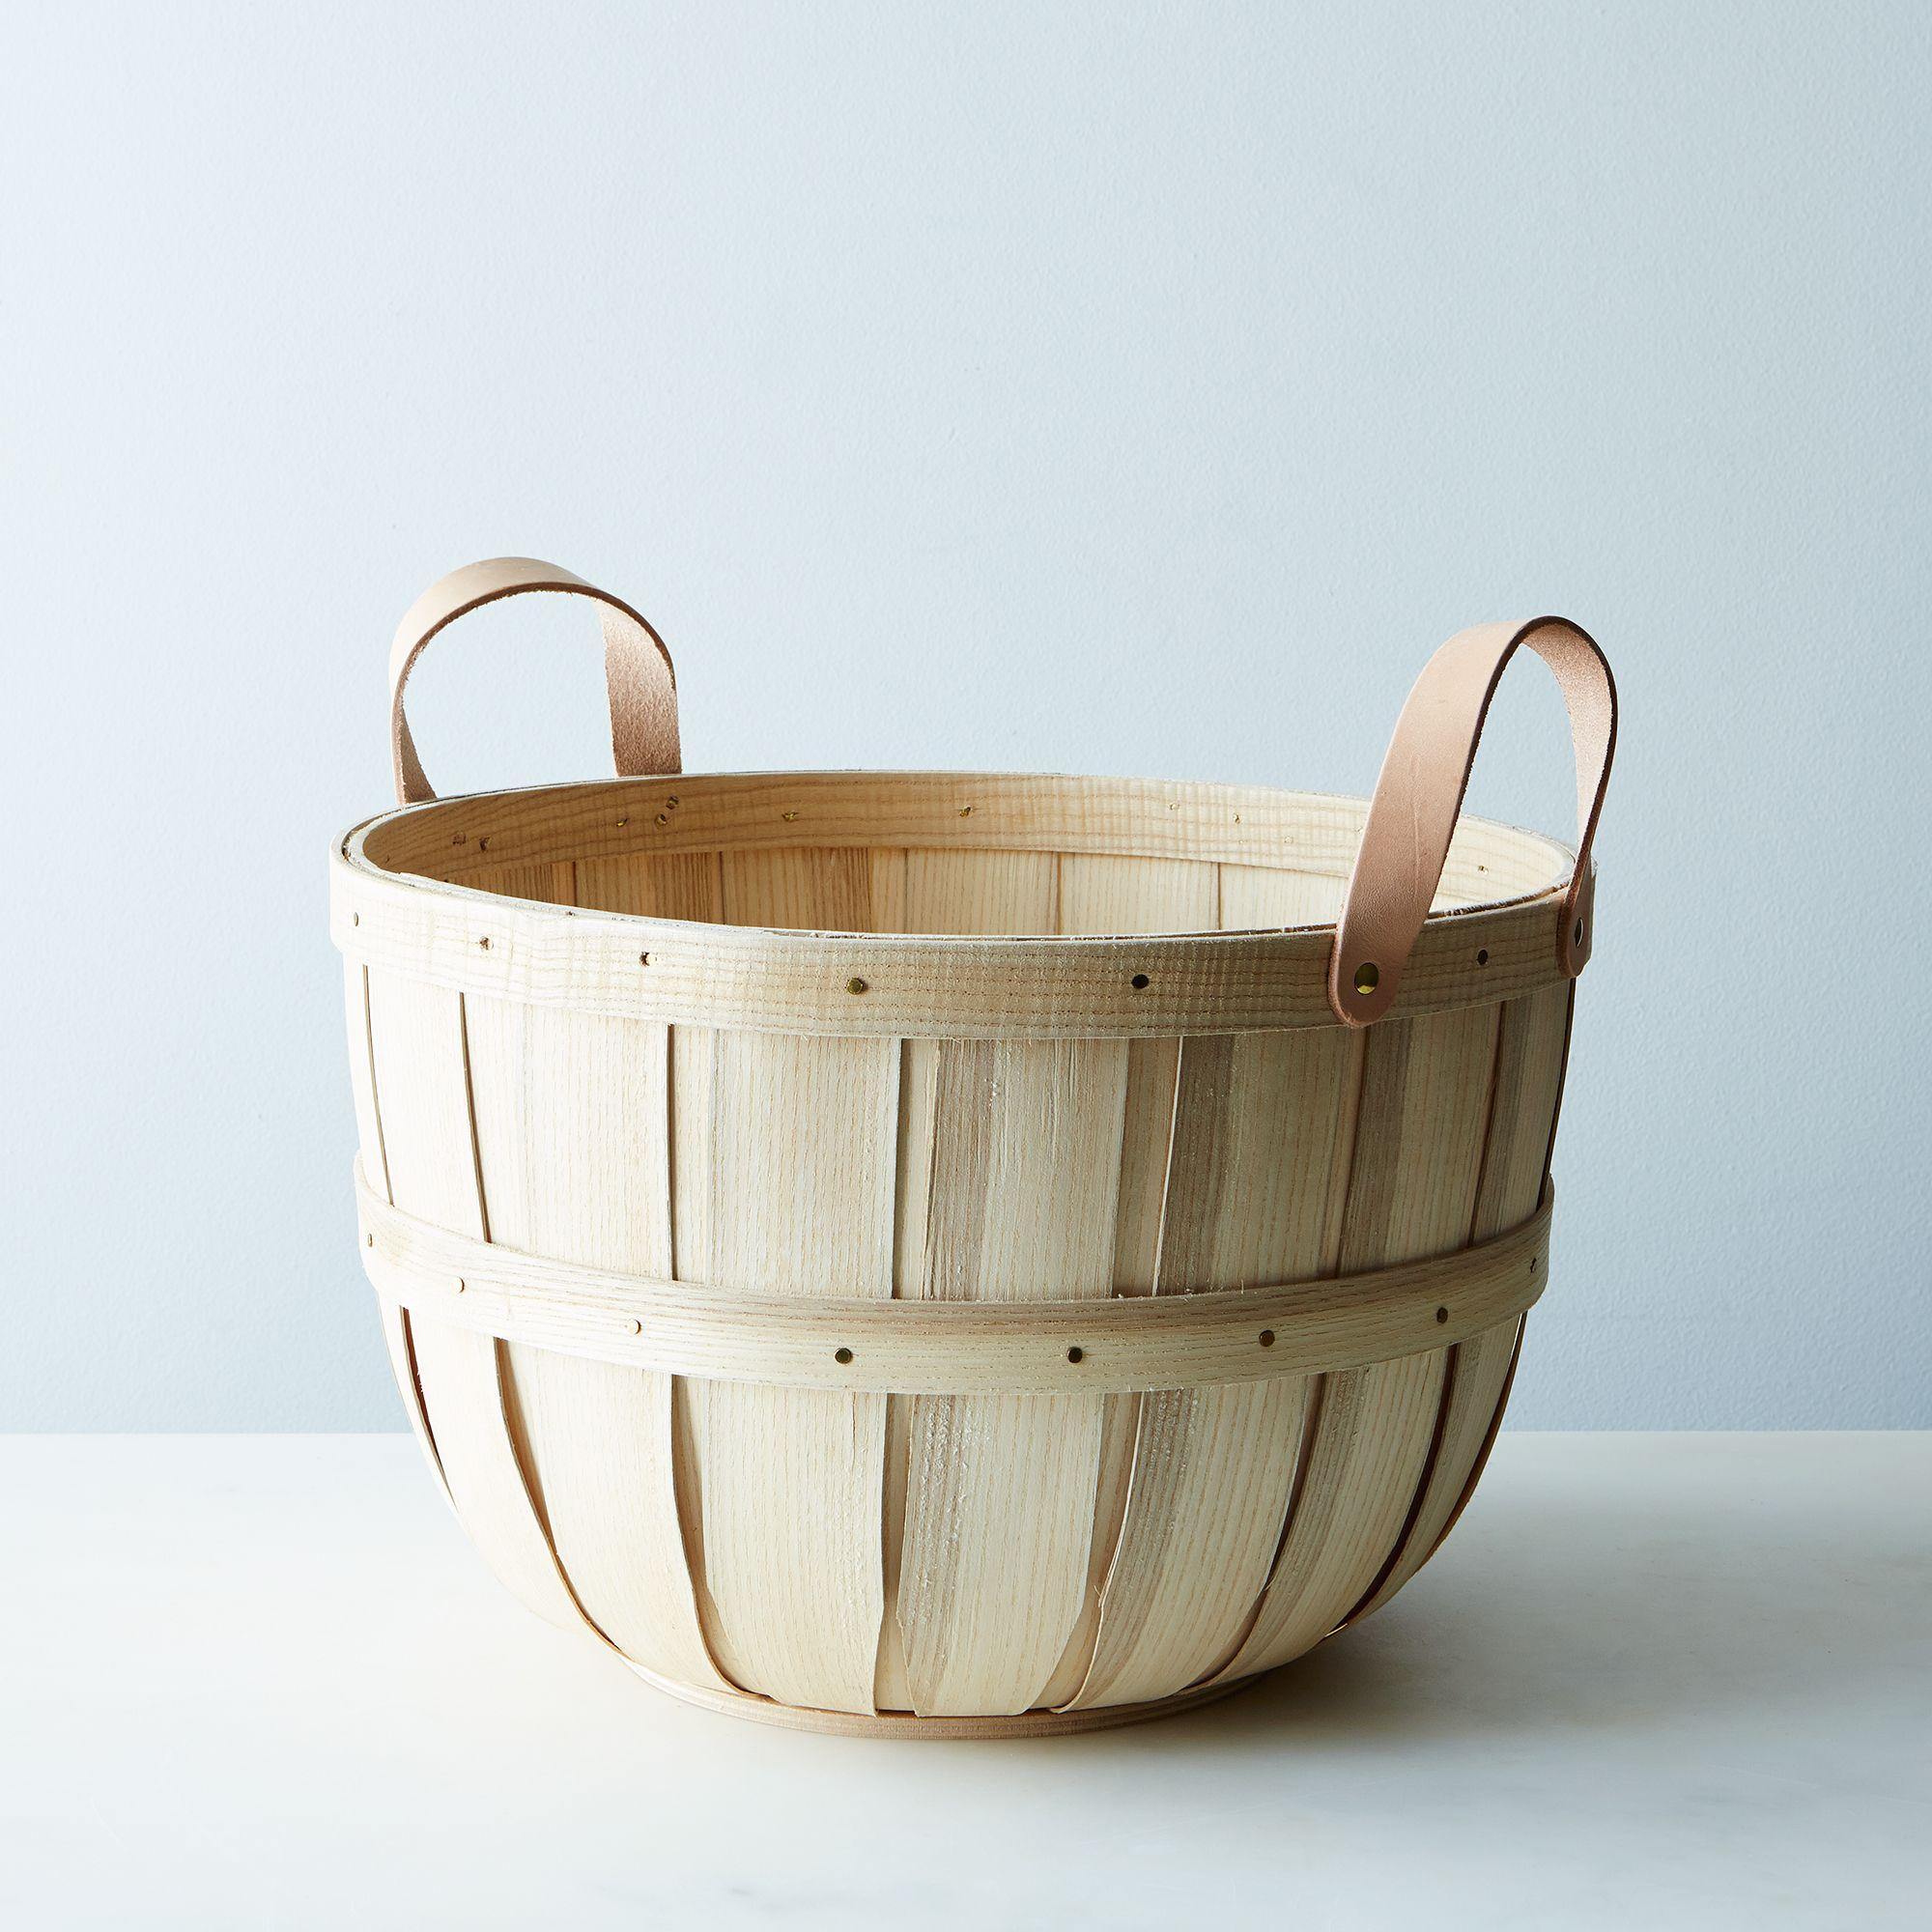 17836a12 a0f7 11e5 a190 0ef7535729df  peterboro basket company half bushel basket provisions mark weinberg 19 09 14 1074 silo